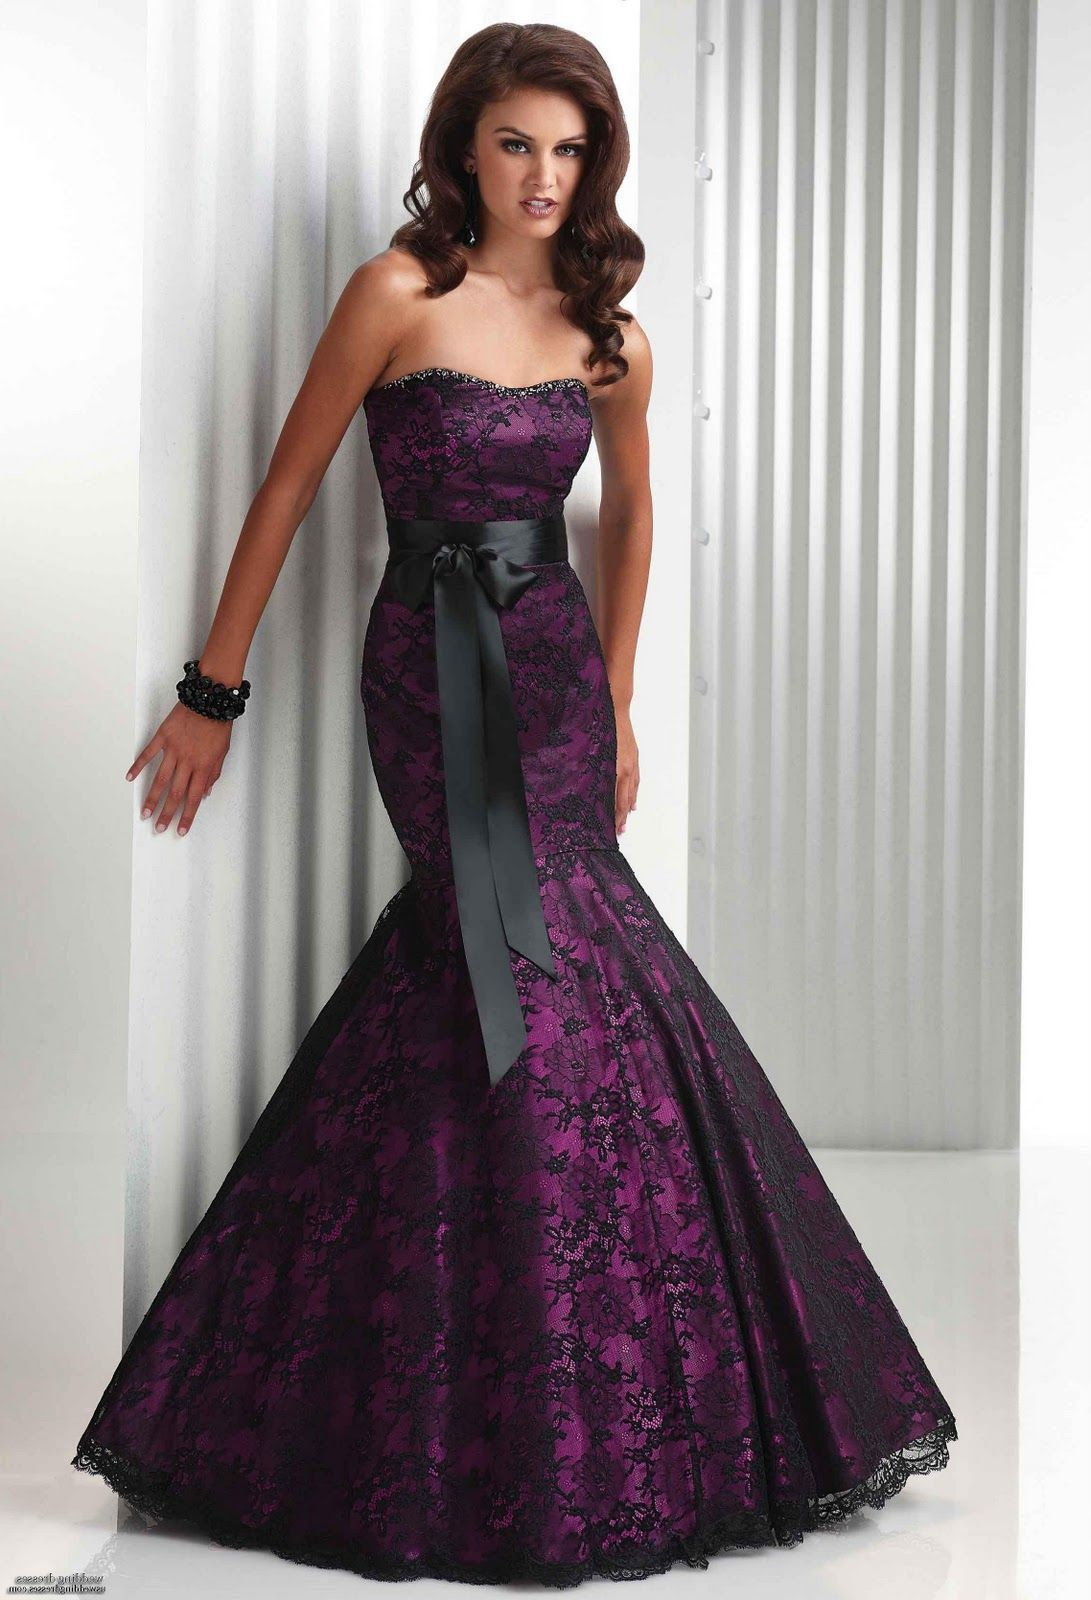 Gothic wedding dresses wilmideus blog black gothic wedding